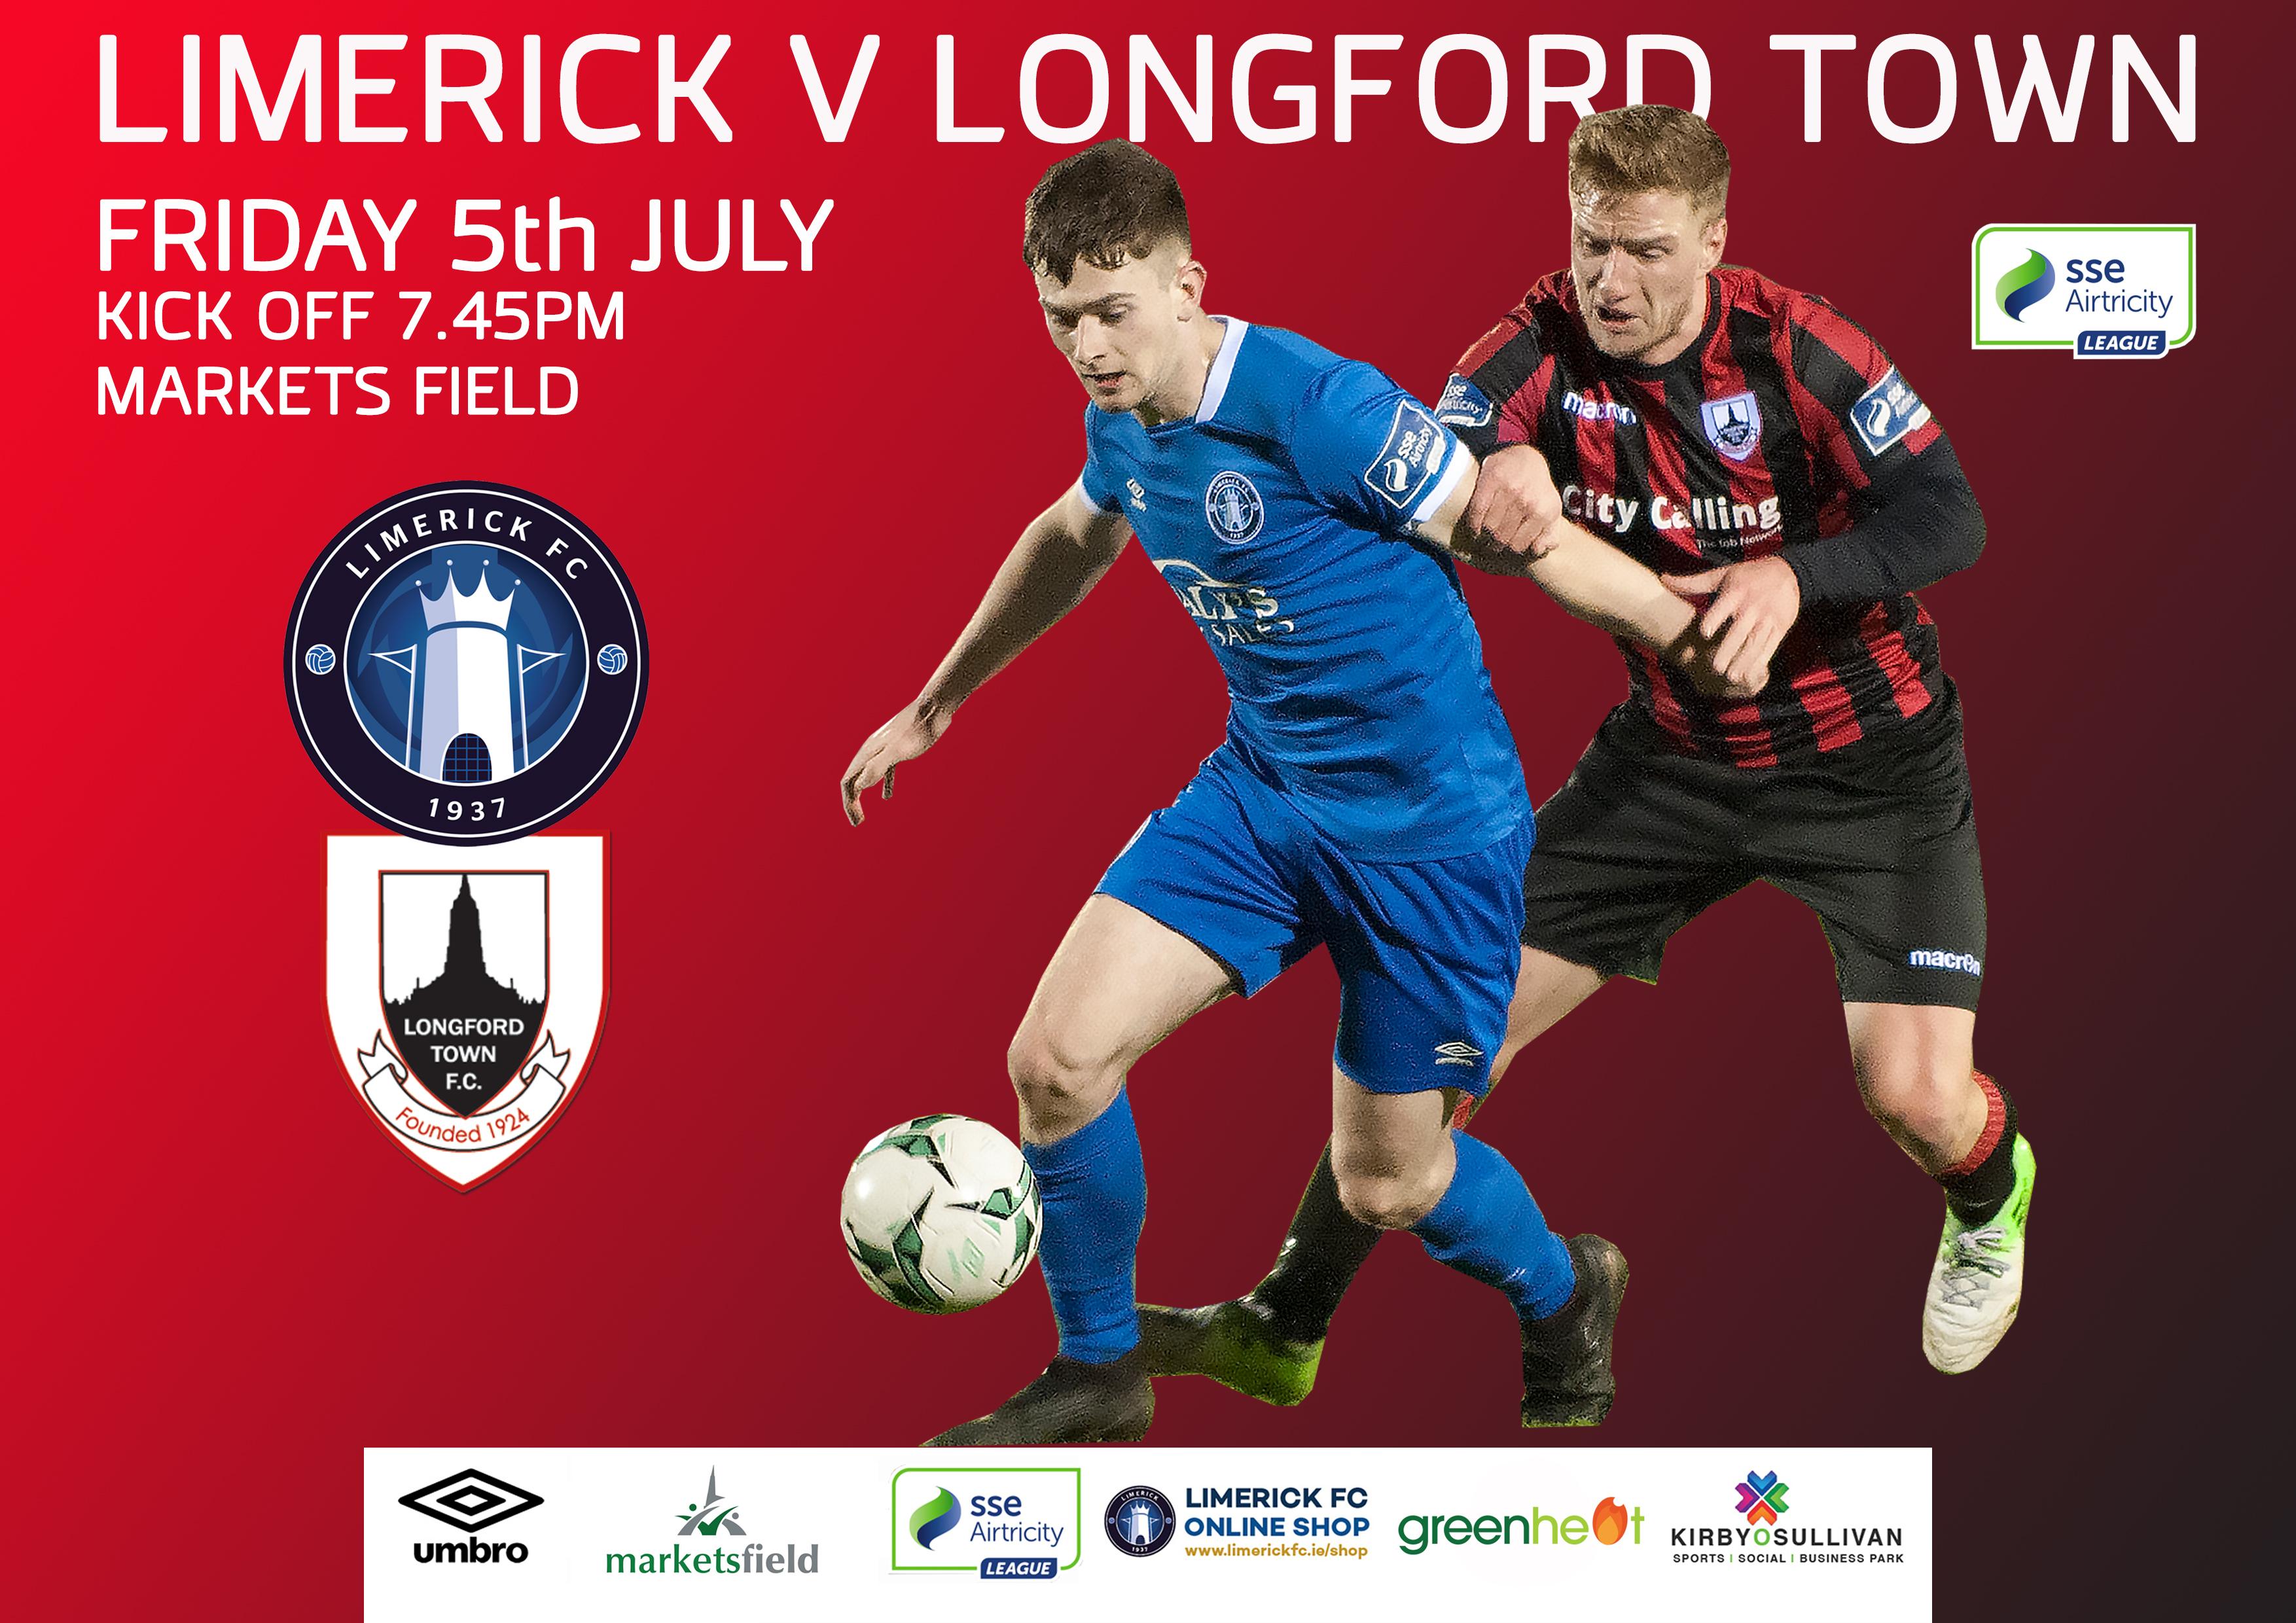 644d41634 Limerick Football Club official website